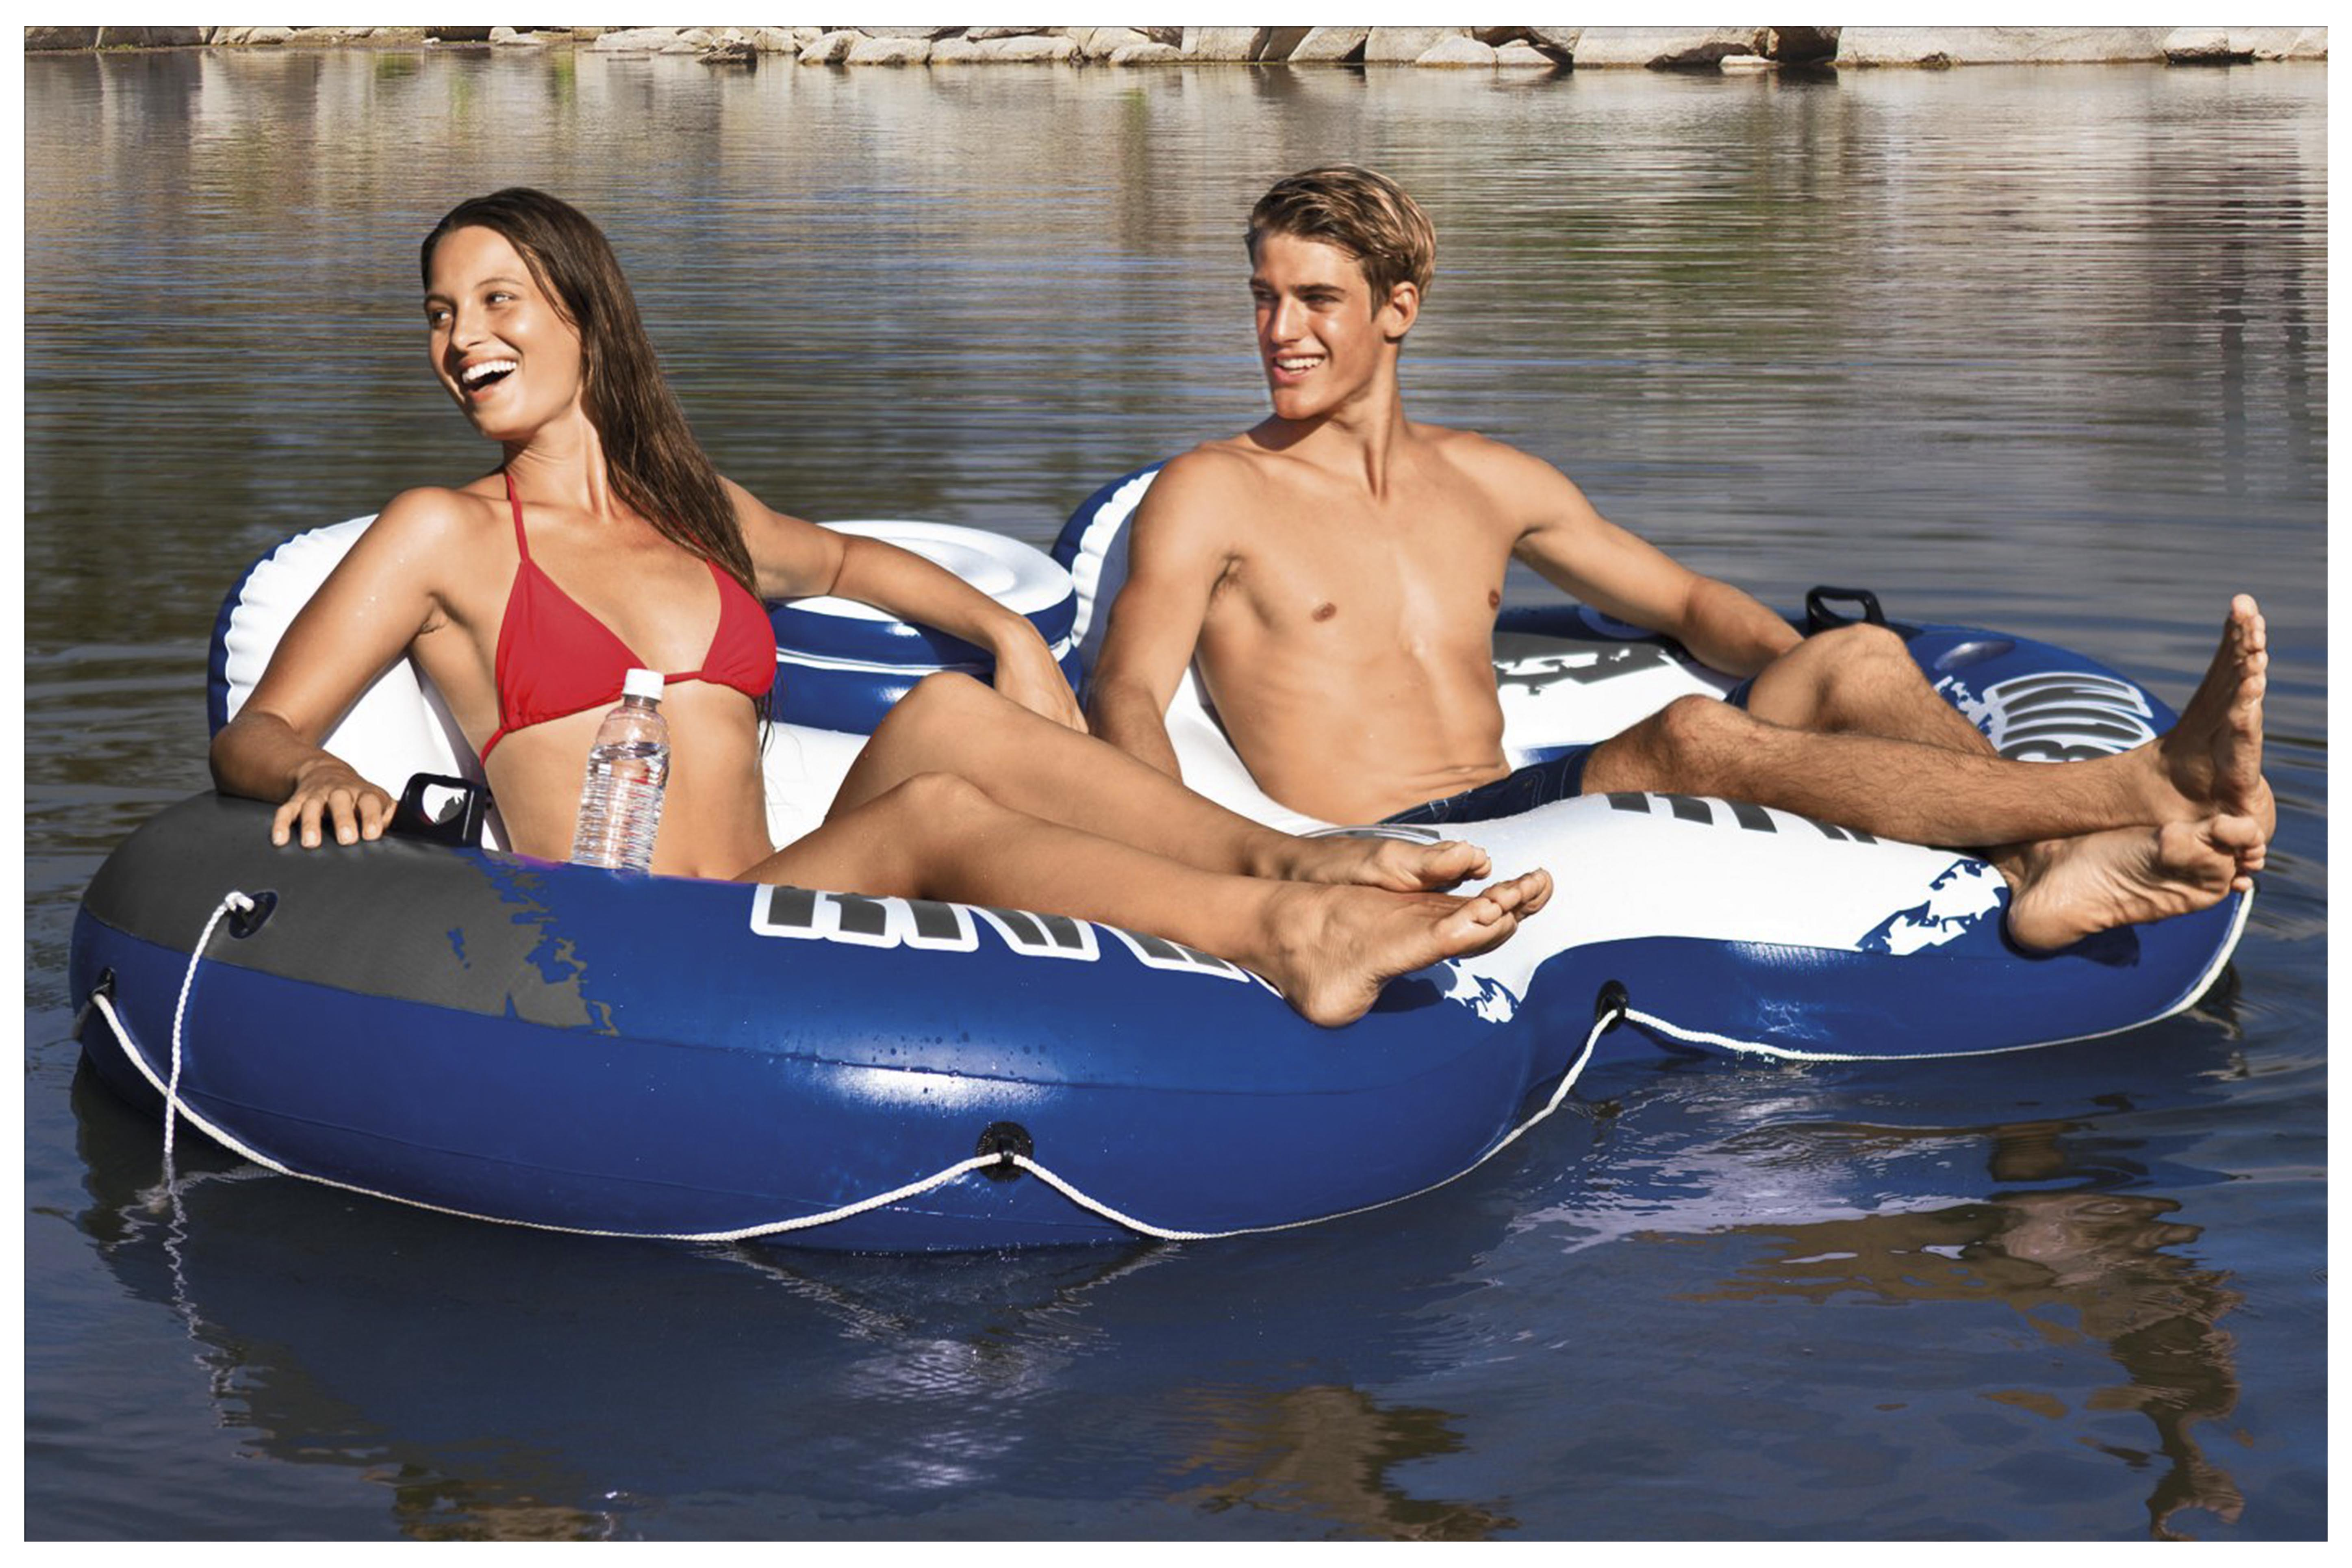 river_float_madison_c